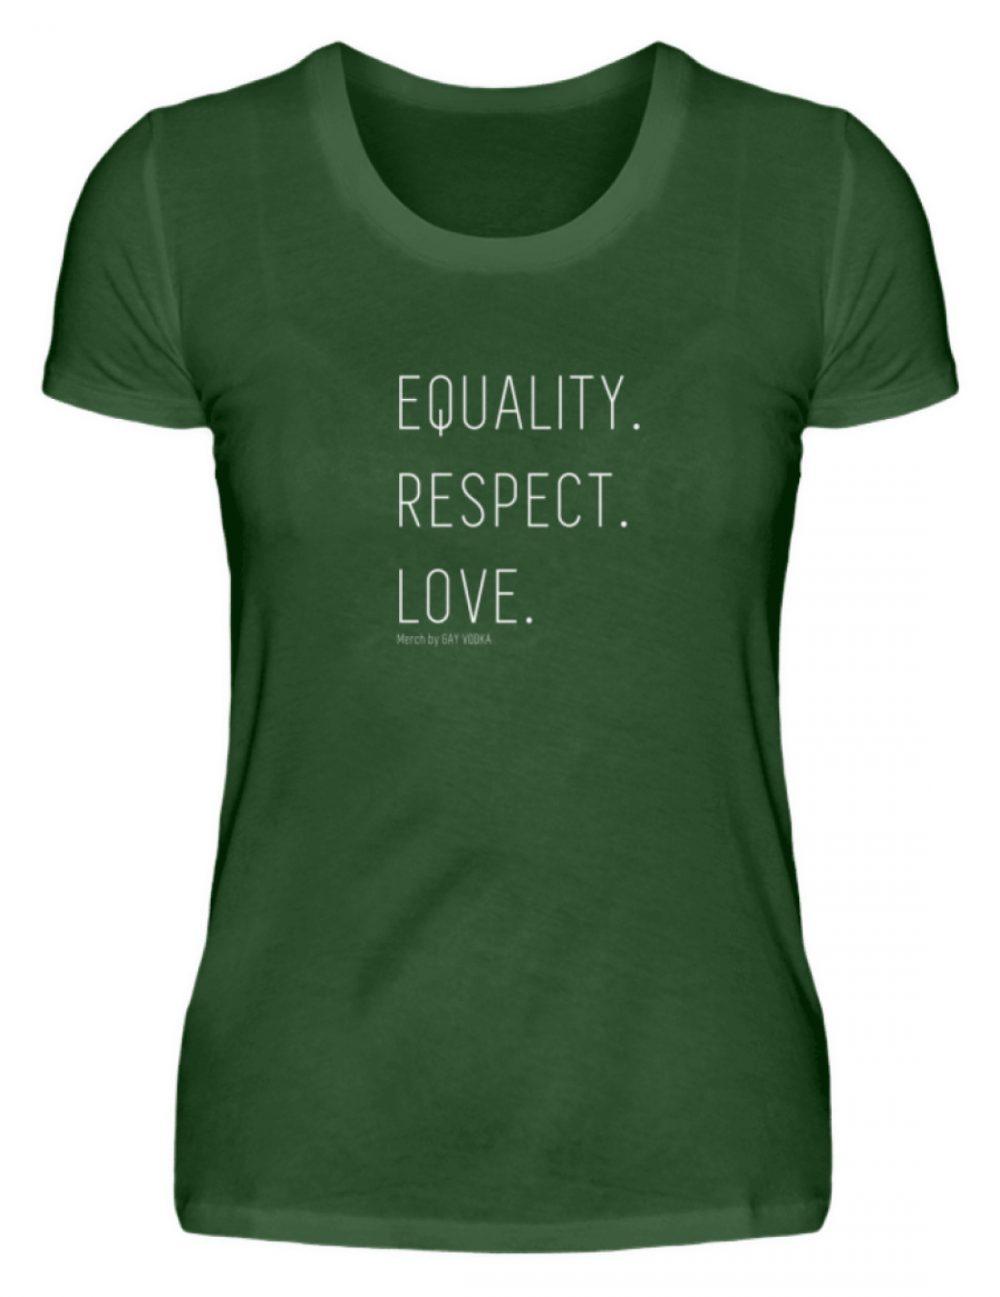 EQUALITY. RESPECT. LOVE. - Damen Premiumshirt-2936